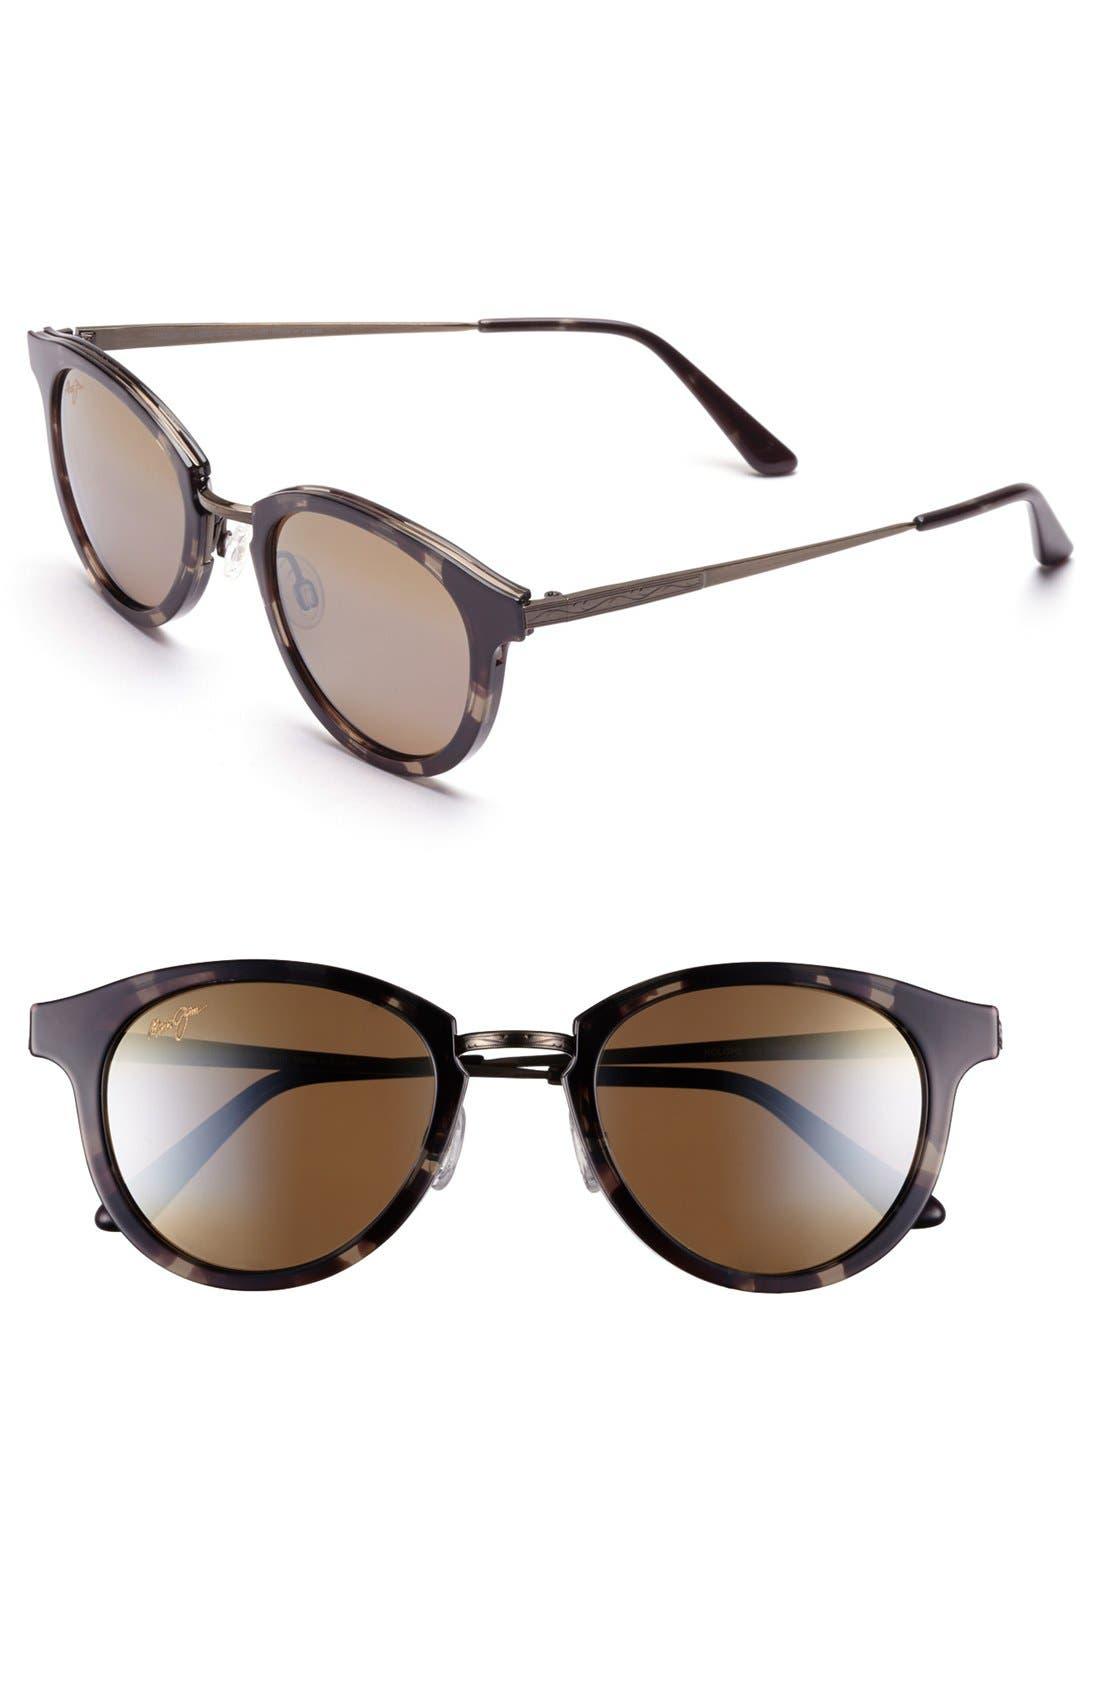 Main Image - Maui Jim 'Kolohe' 50mm Polarized Sunglasses